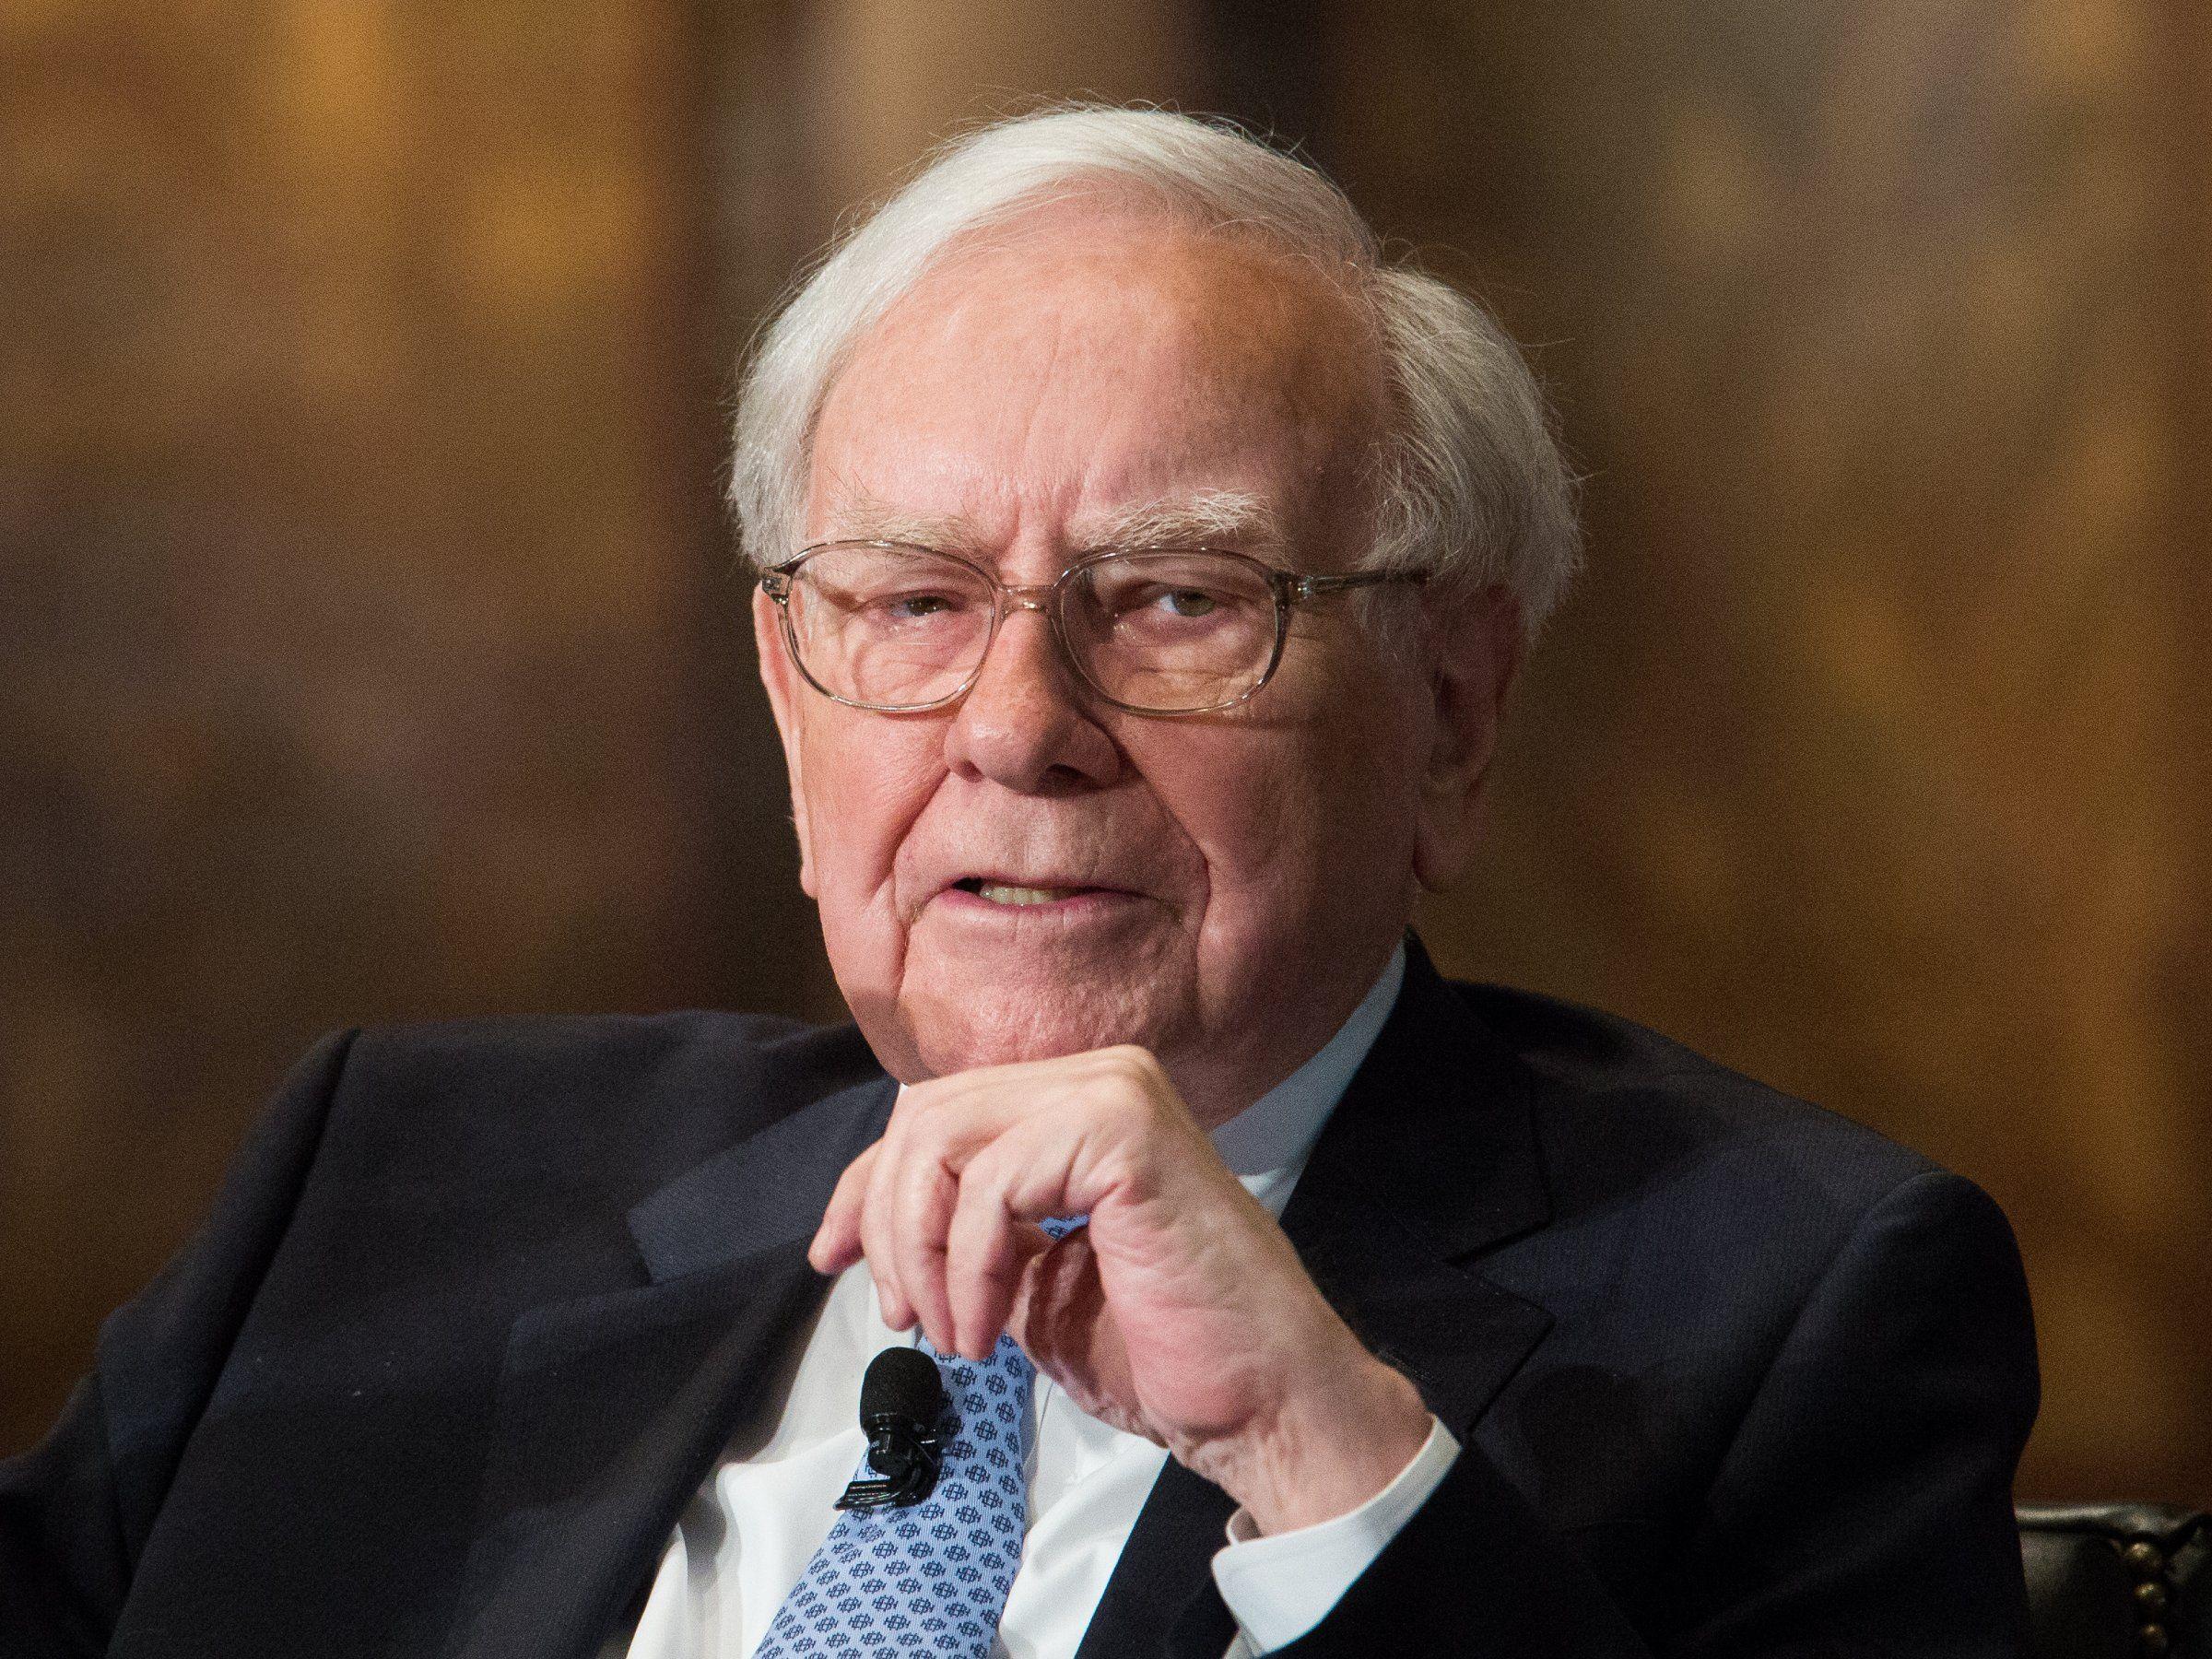 Компания Уоррена Баффетта купила 75млн акций Apple- Kapital.kz